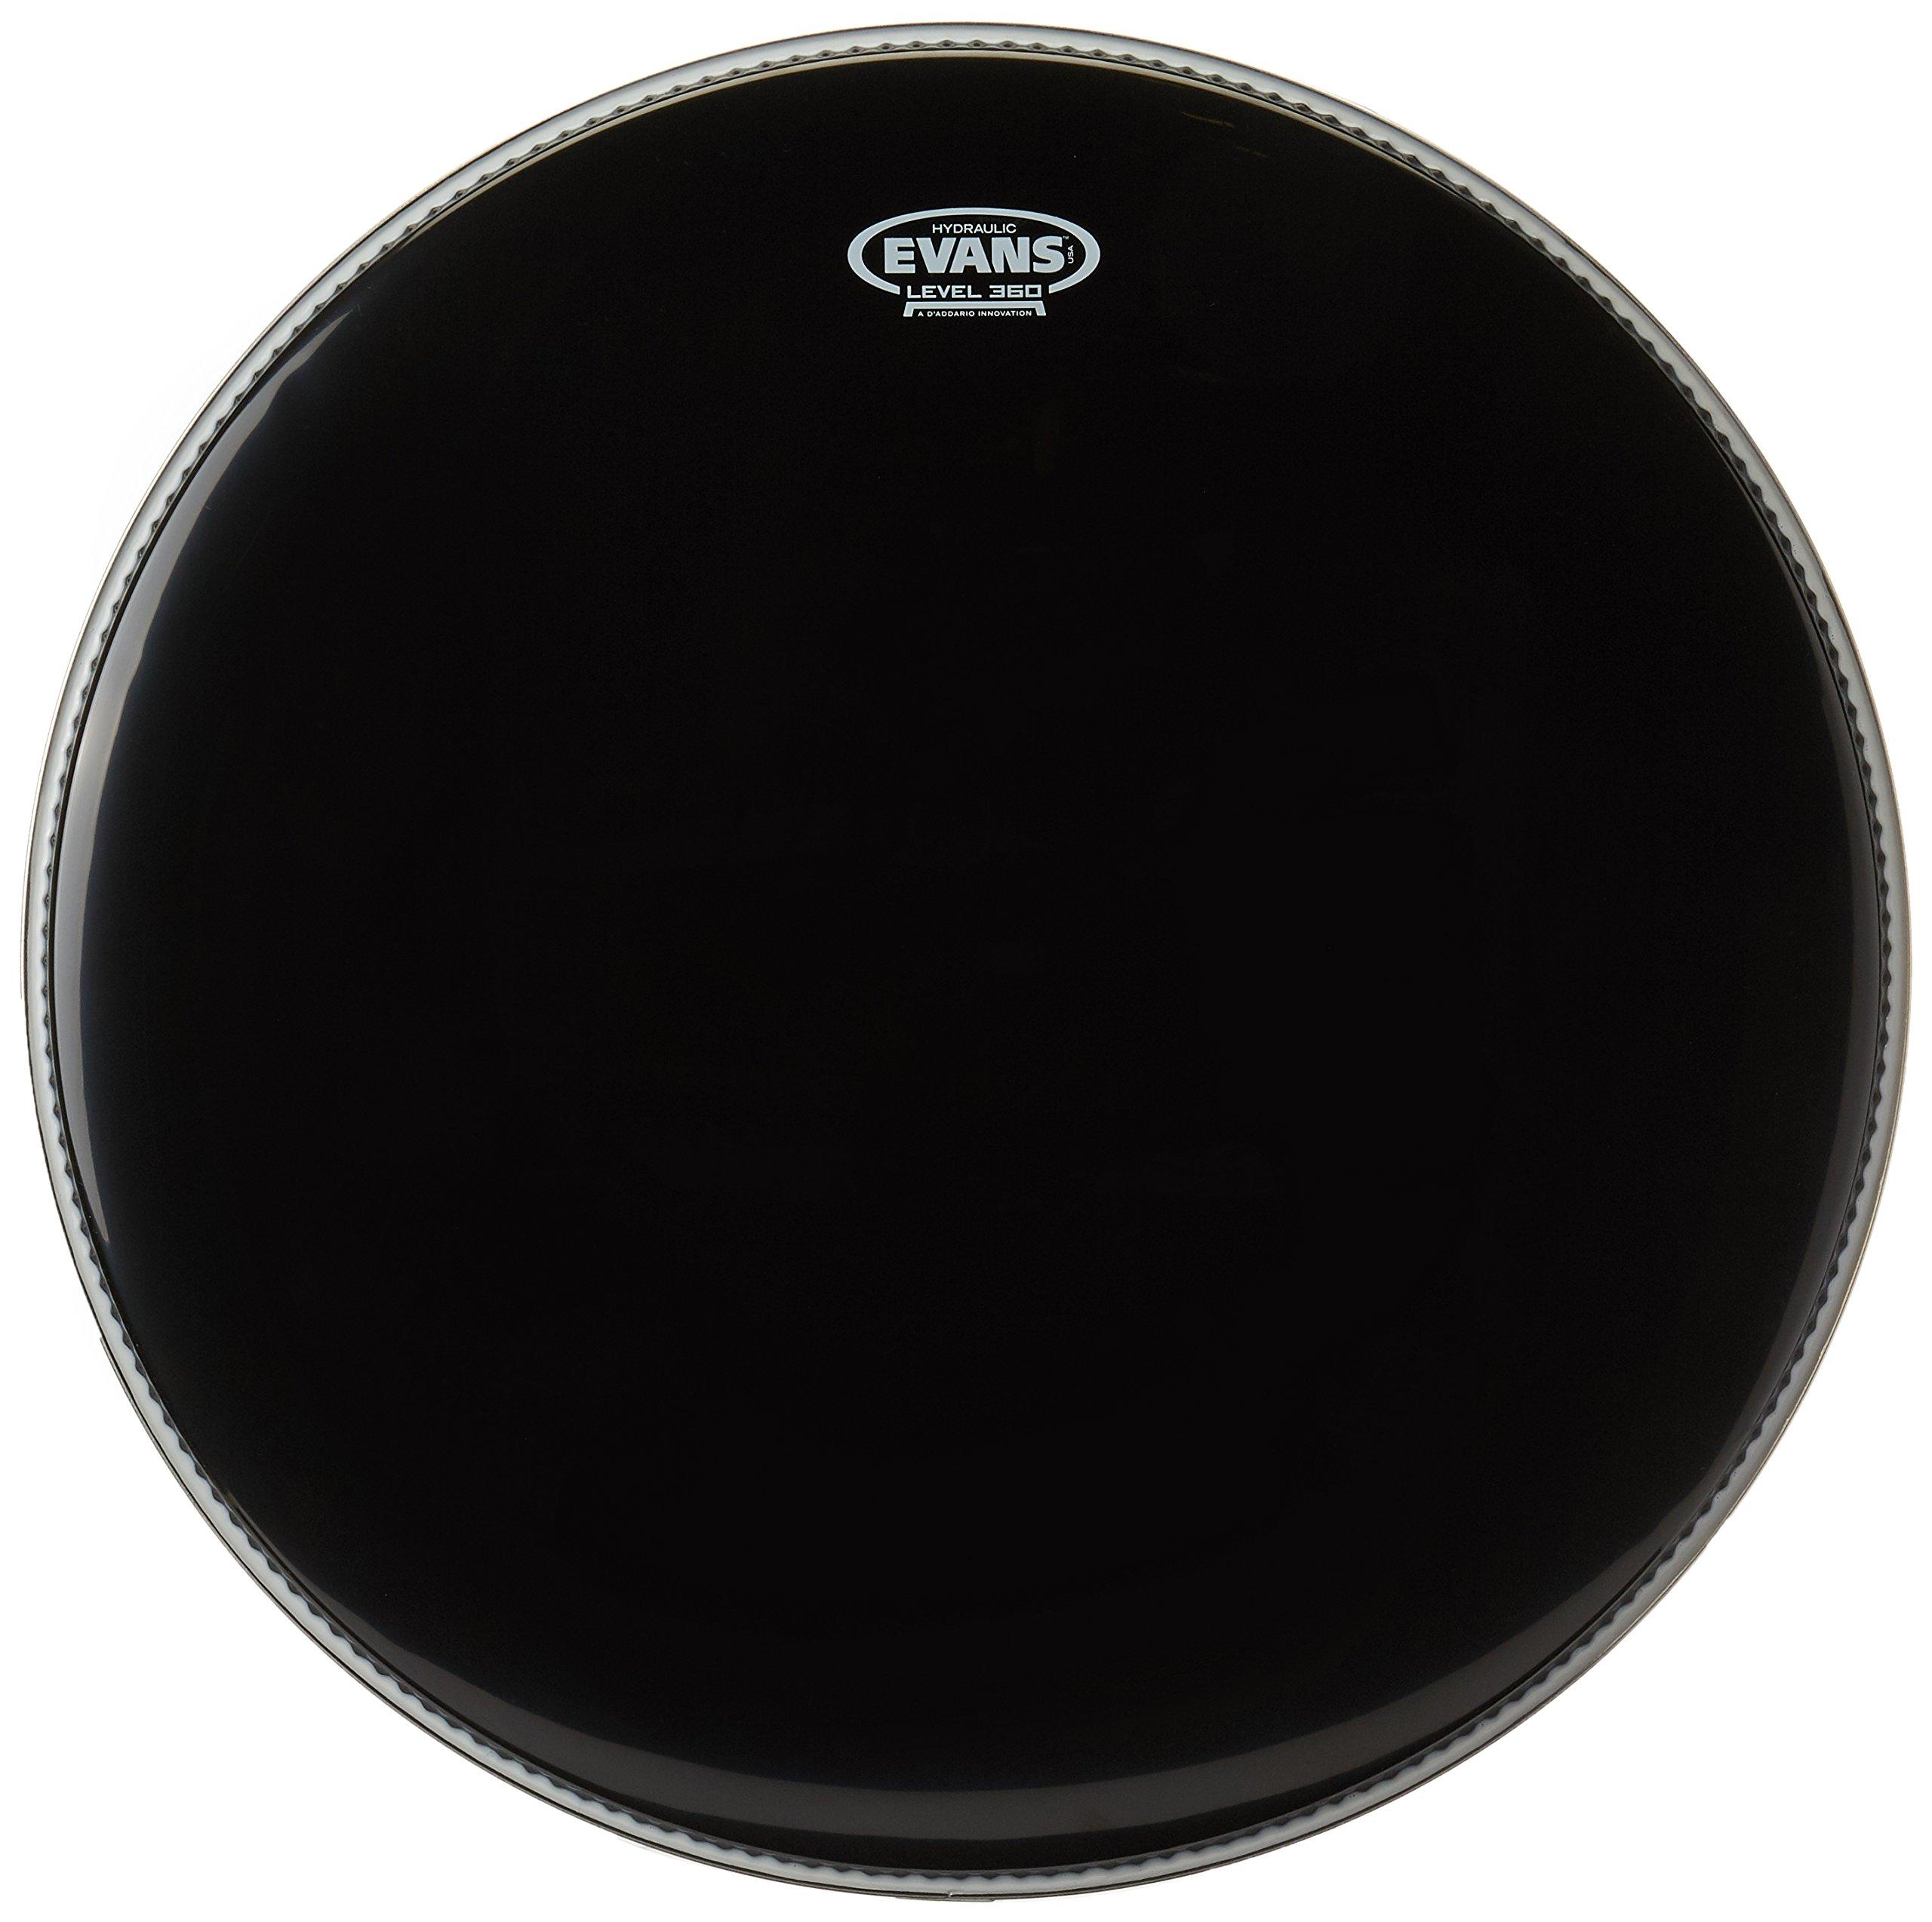 galleon evans black hydraulic bass drum head 22 inch. Black Bedroom Furniture Sets. Home Design Ideas